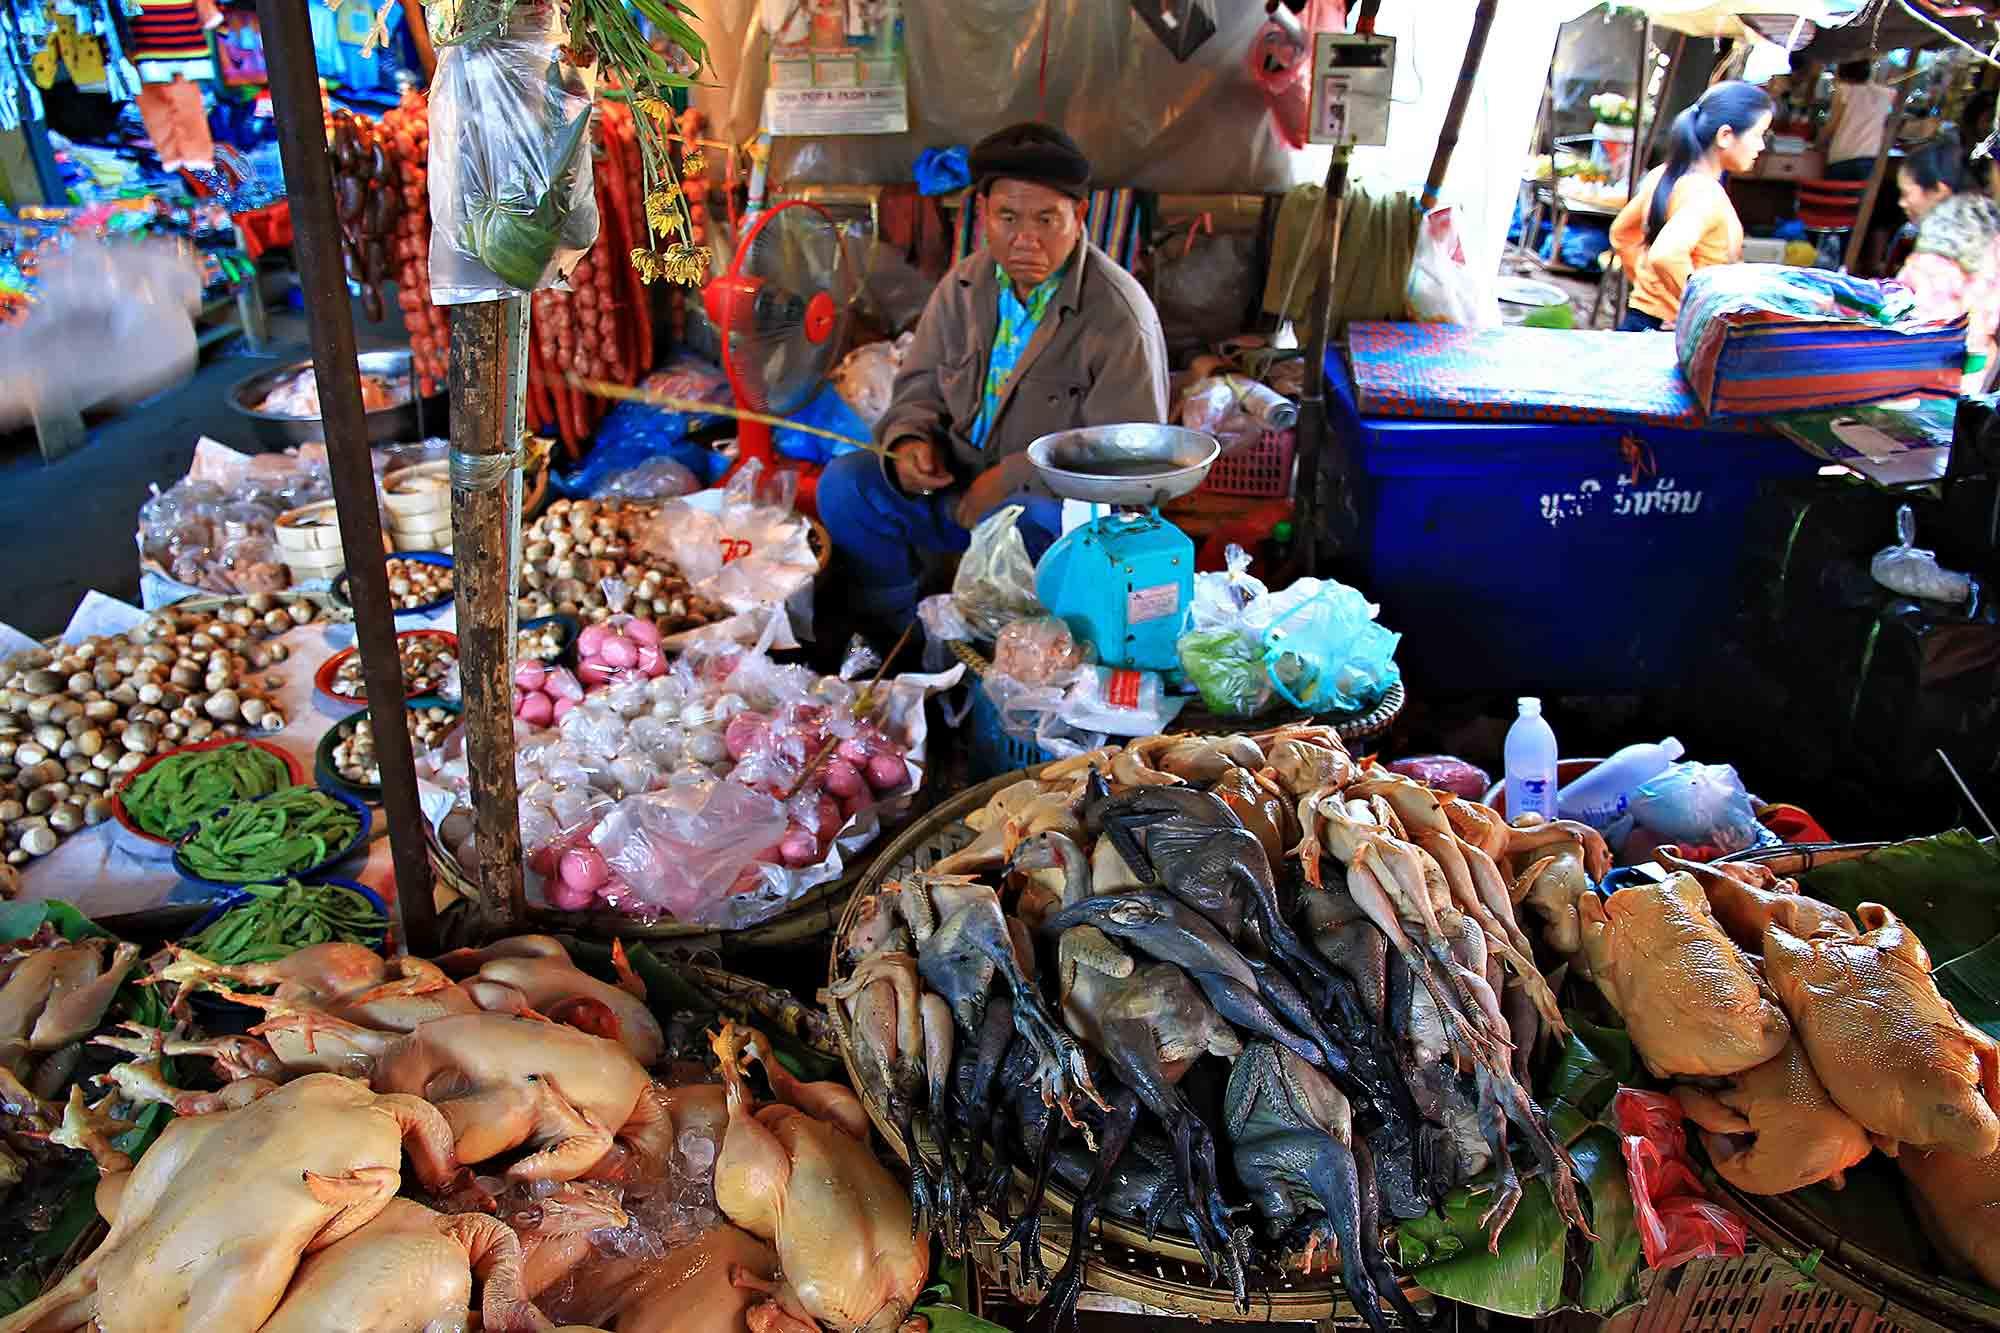 Market life in Tha Khek, Laos. © Ulli Maier & Nisa Maier